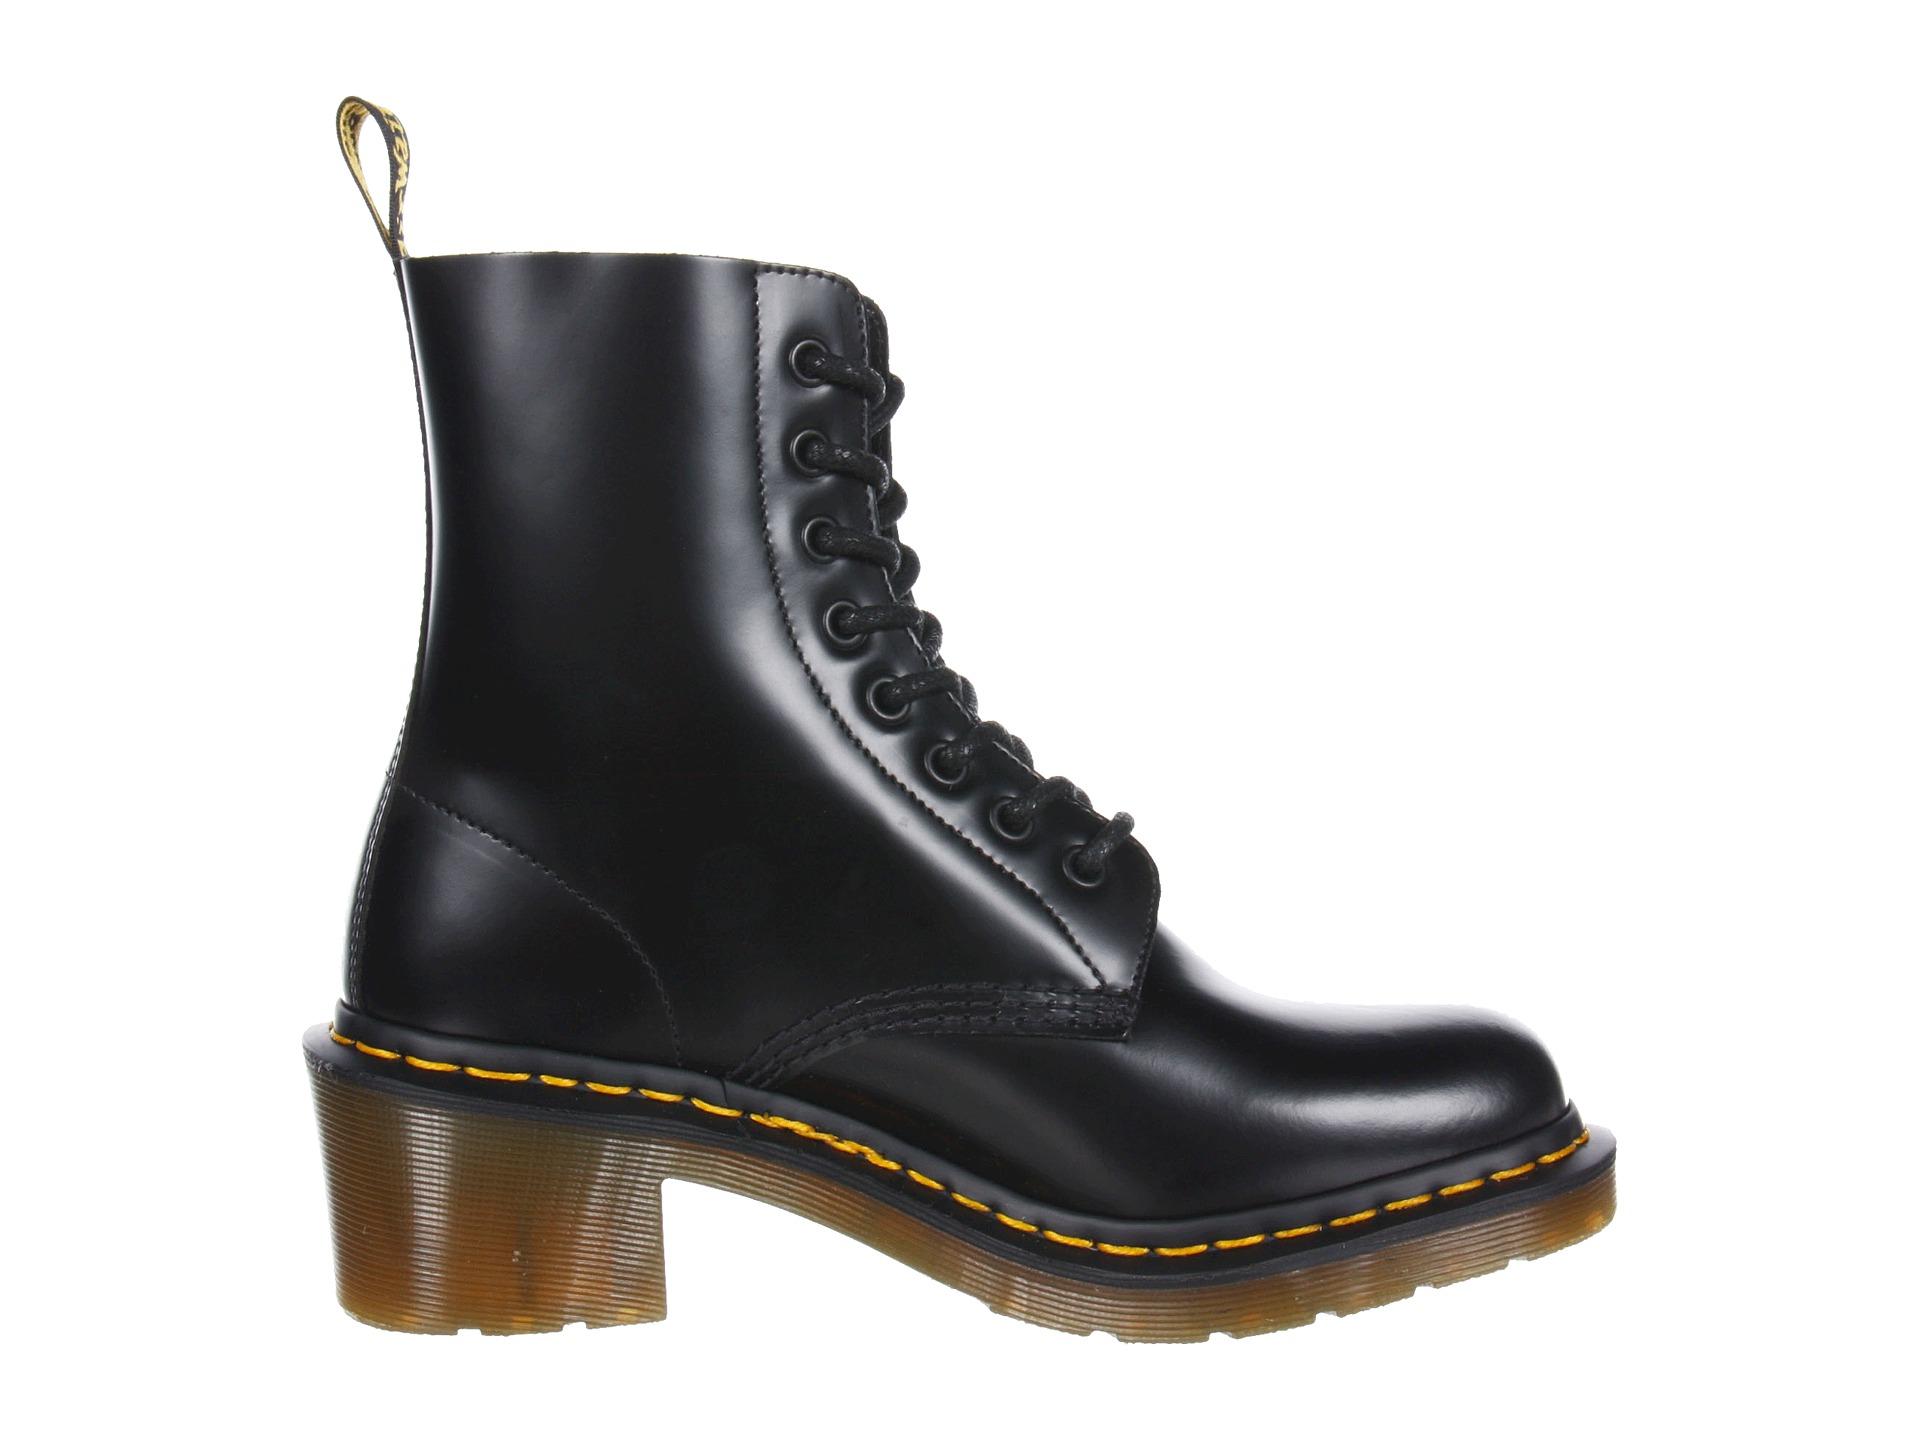 Dr Martens Clemency Boot April 2017